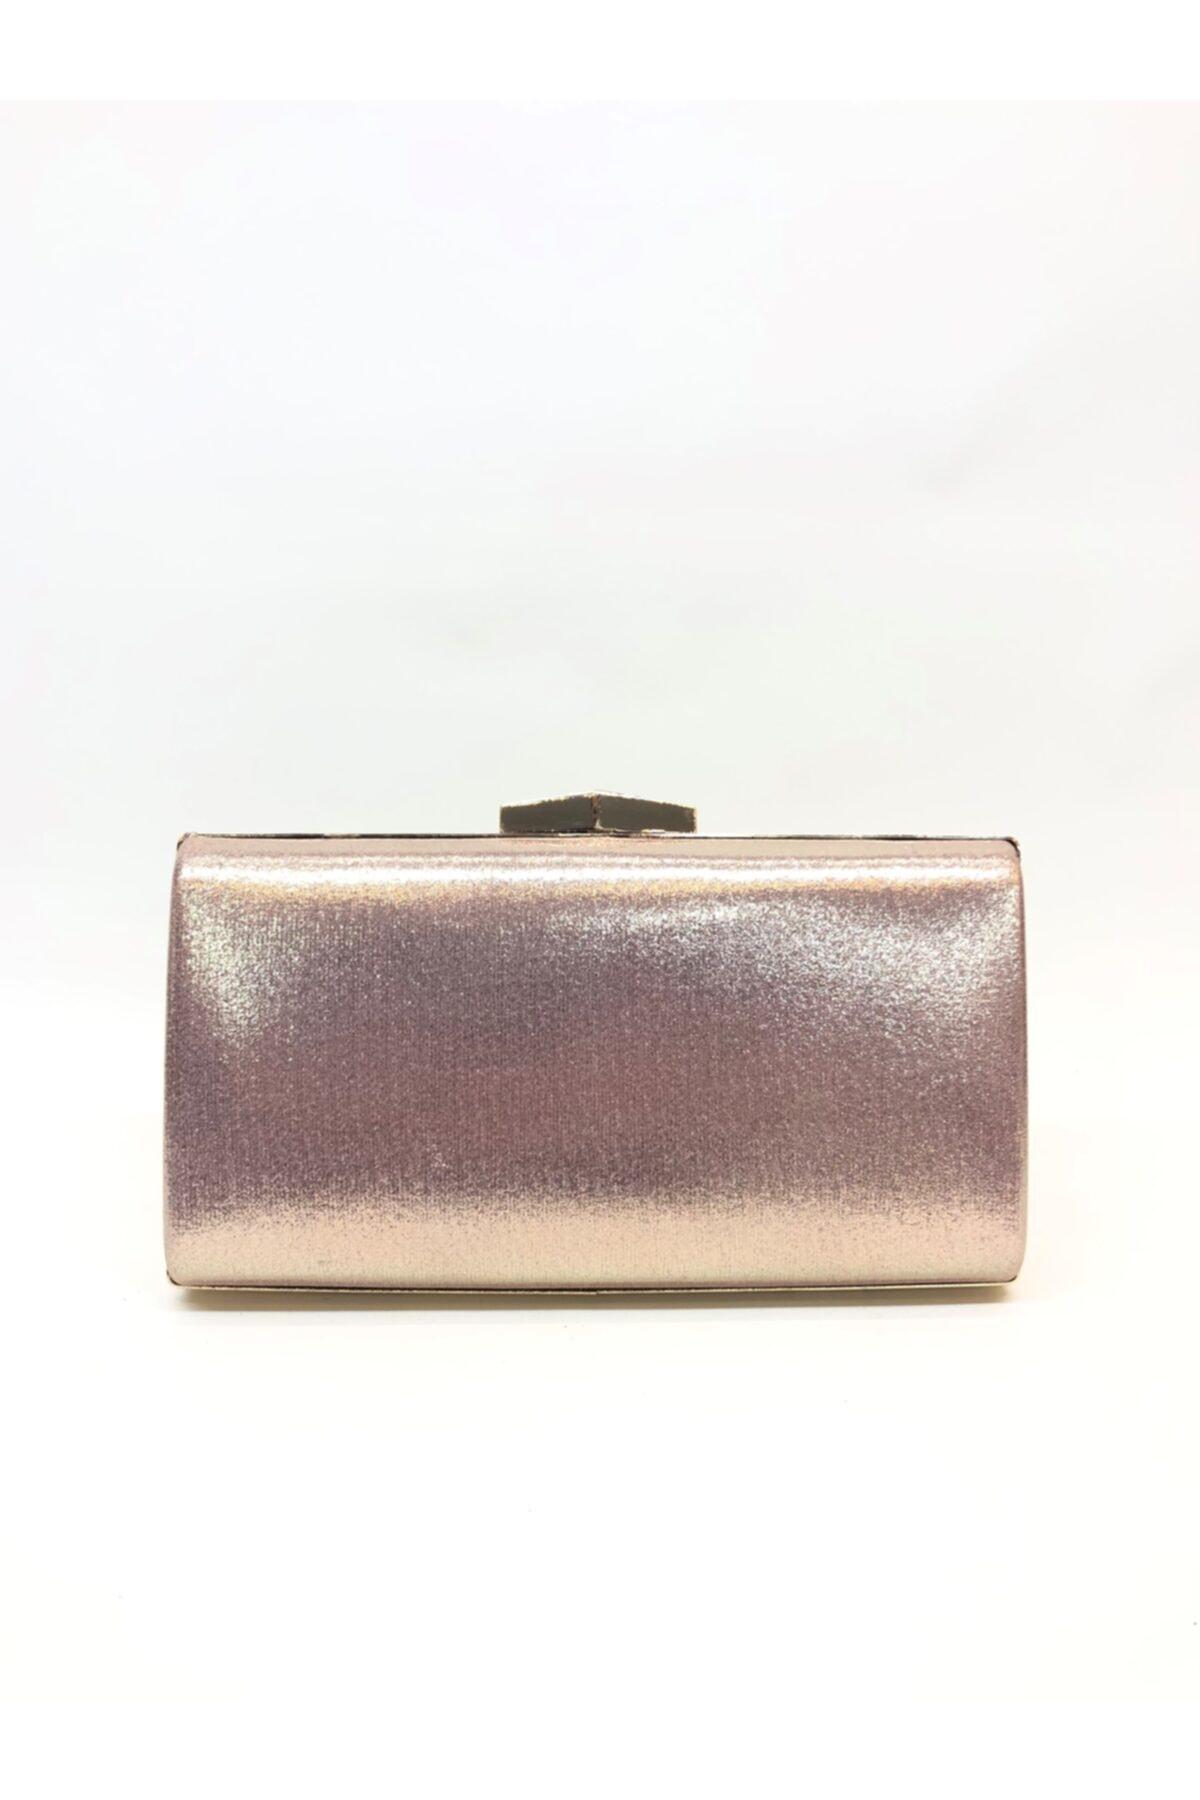 Kadın Rose Rengi Portföy Clutch Çanta